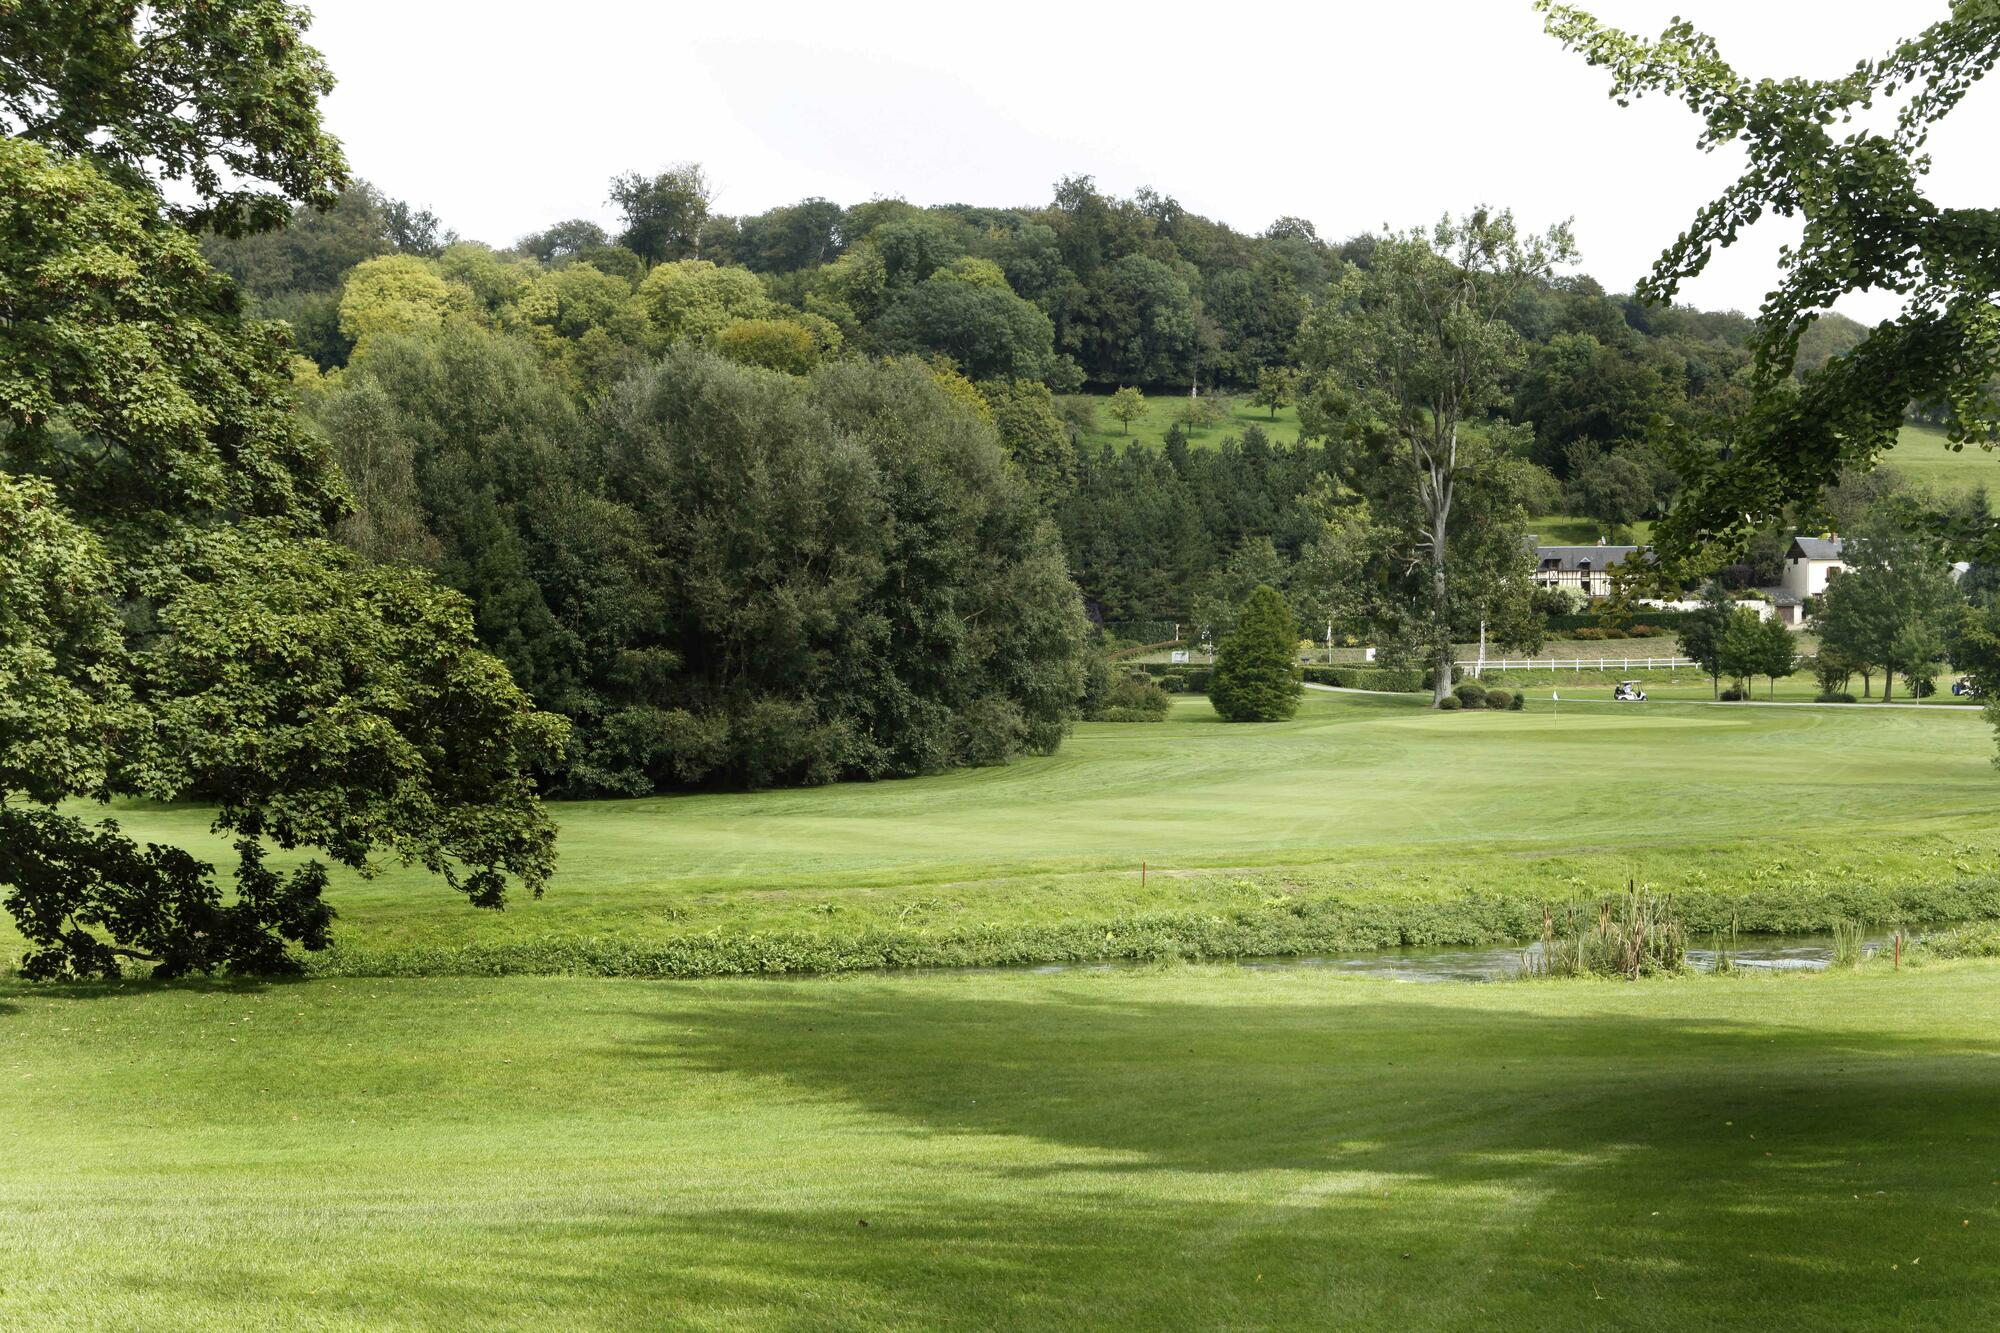 Golf Hotel de Saint-Saëns in Normandy